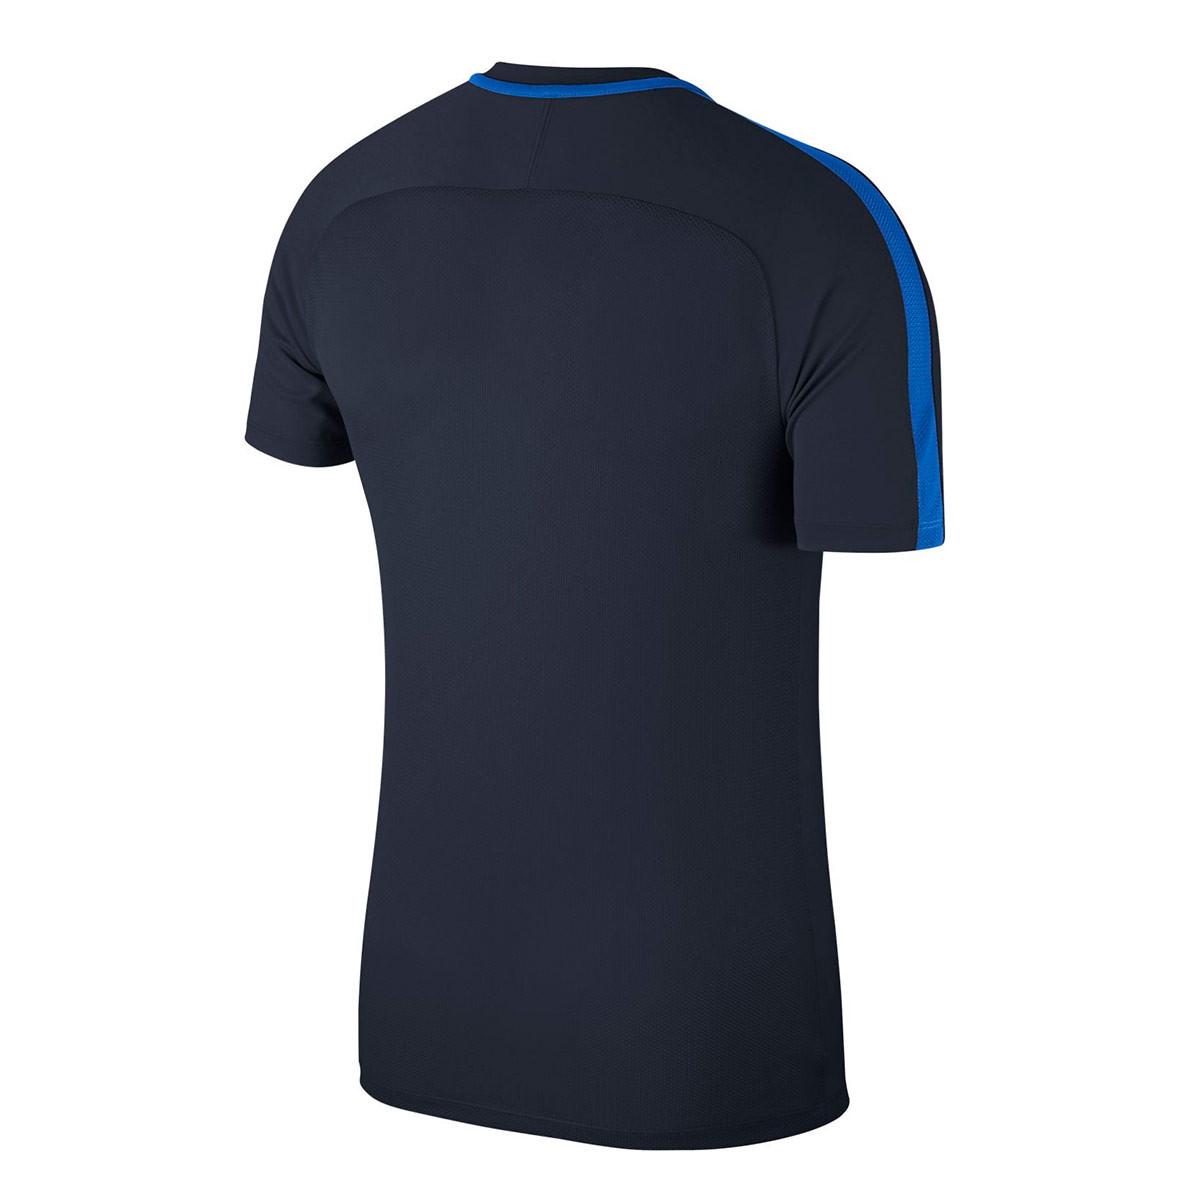 Aventurarse competencia Sarabo árabe  Jersey Nike Academy 18 Training m/c Obsidian-Royal blue-White - Football  store Fútbol Emotion